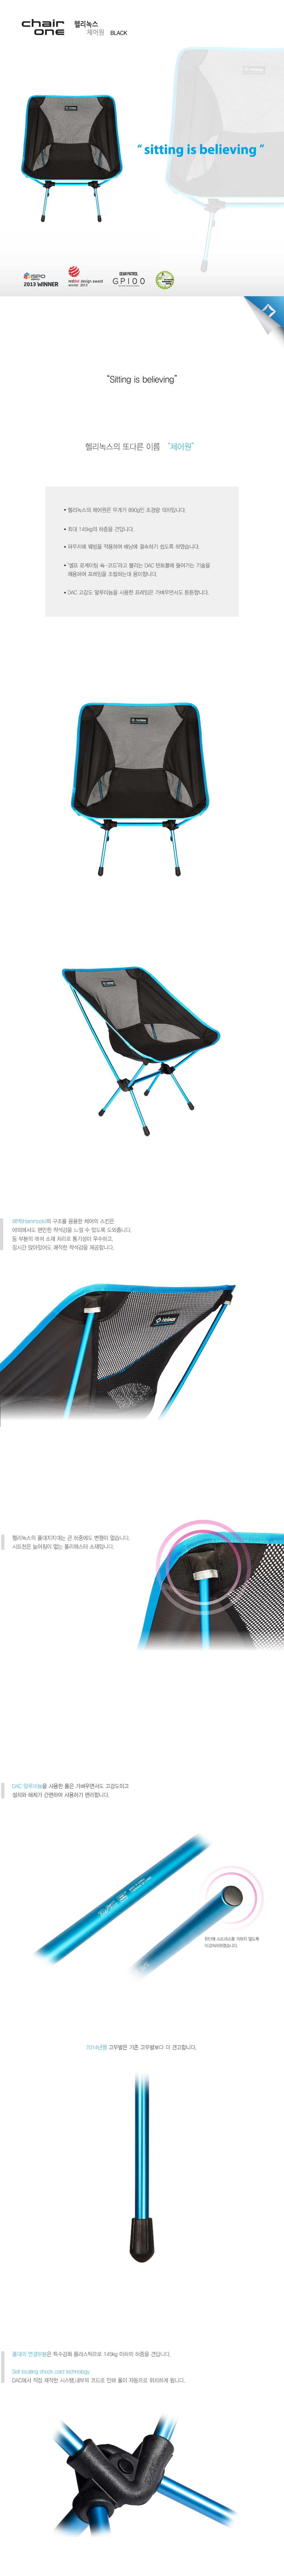 20160713-Helinox_chair-one_상품페이지.jpg